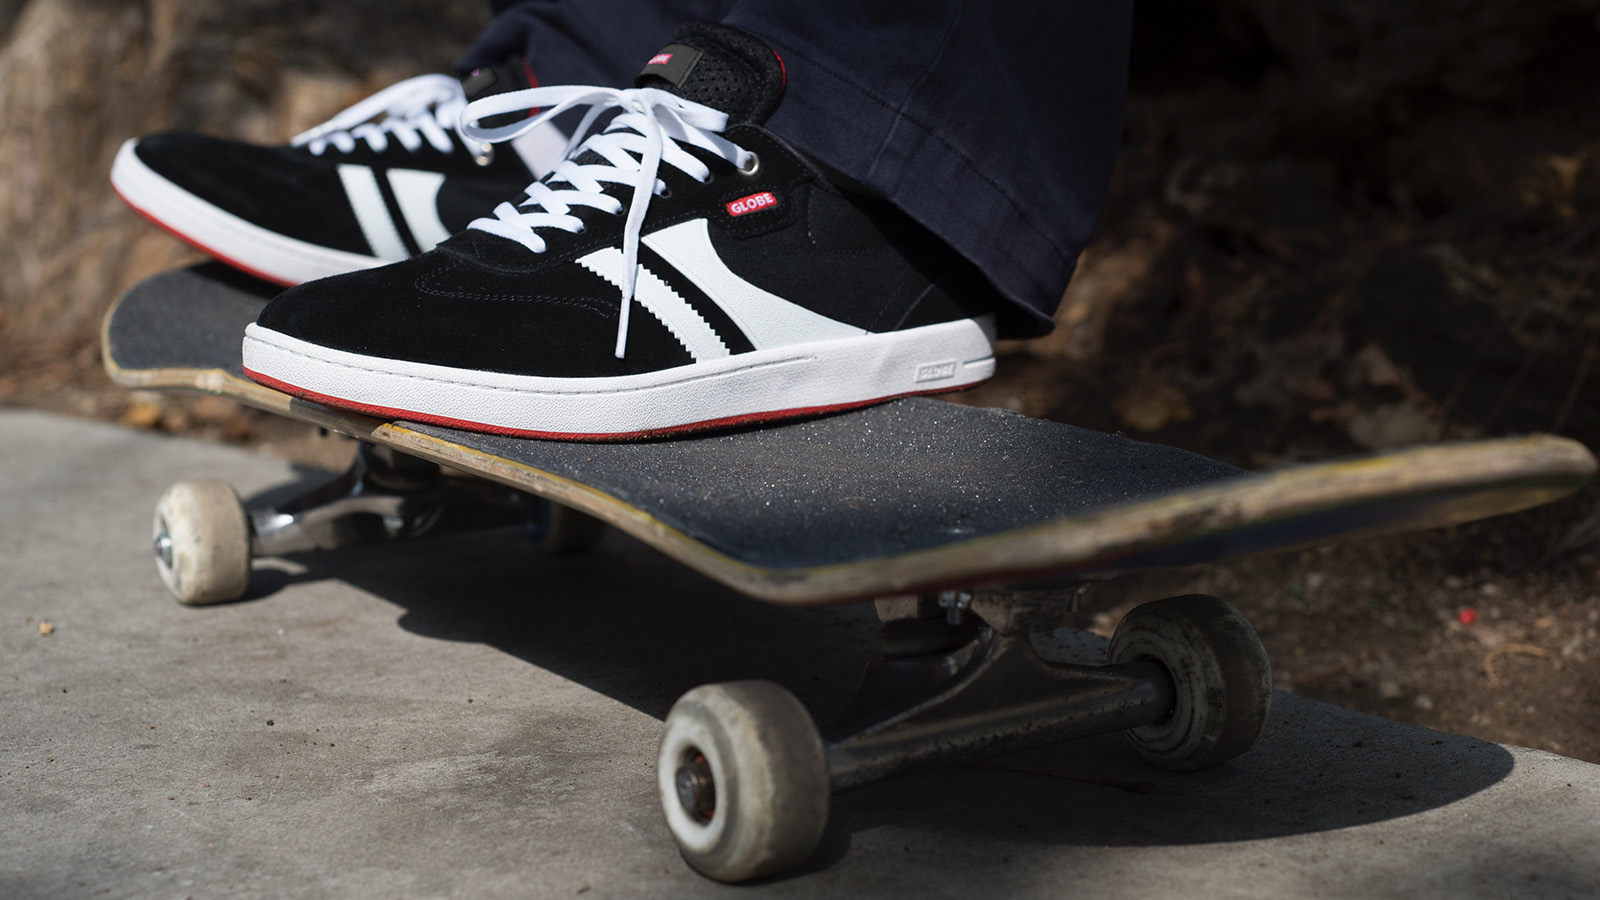 Globe SS20 Skate Shoe Preview